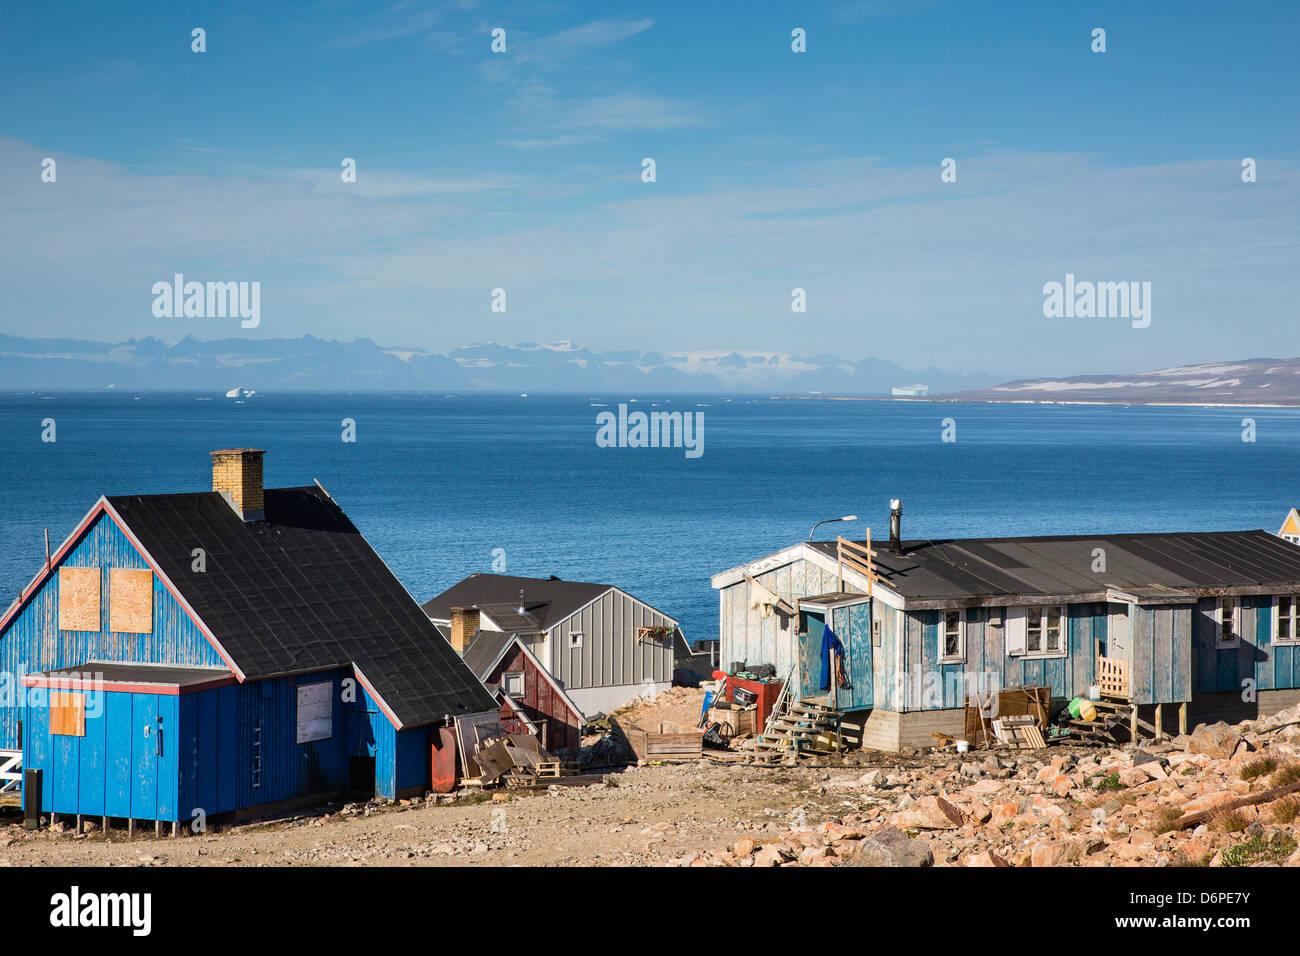 Pueblo Inuit, Ittoqqortoormiit, Scoresbysund, al noreste de Groenlandia, las regiones polares Foto de stock